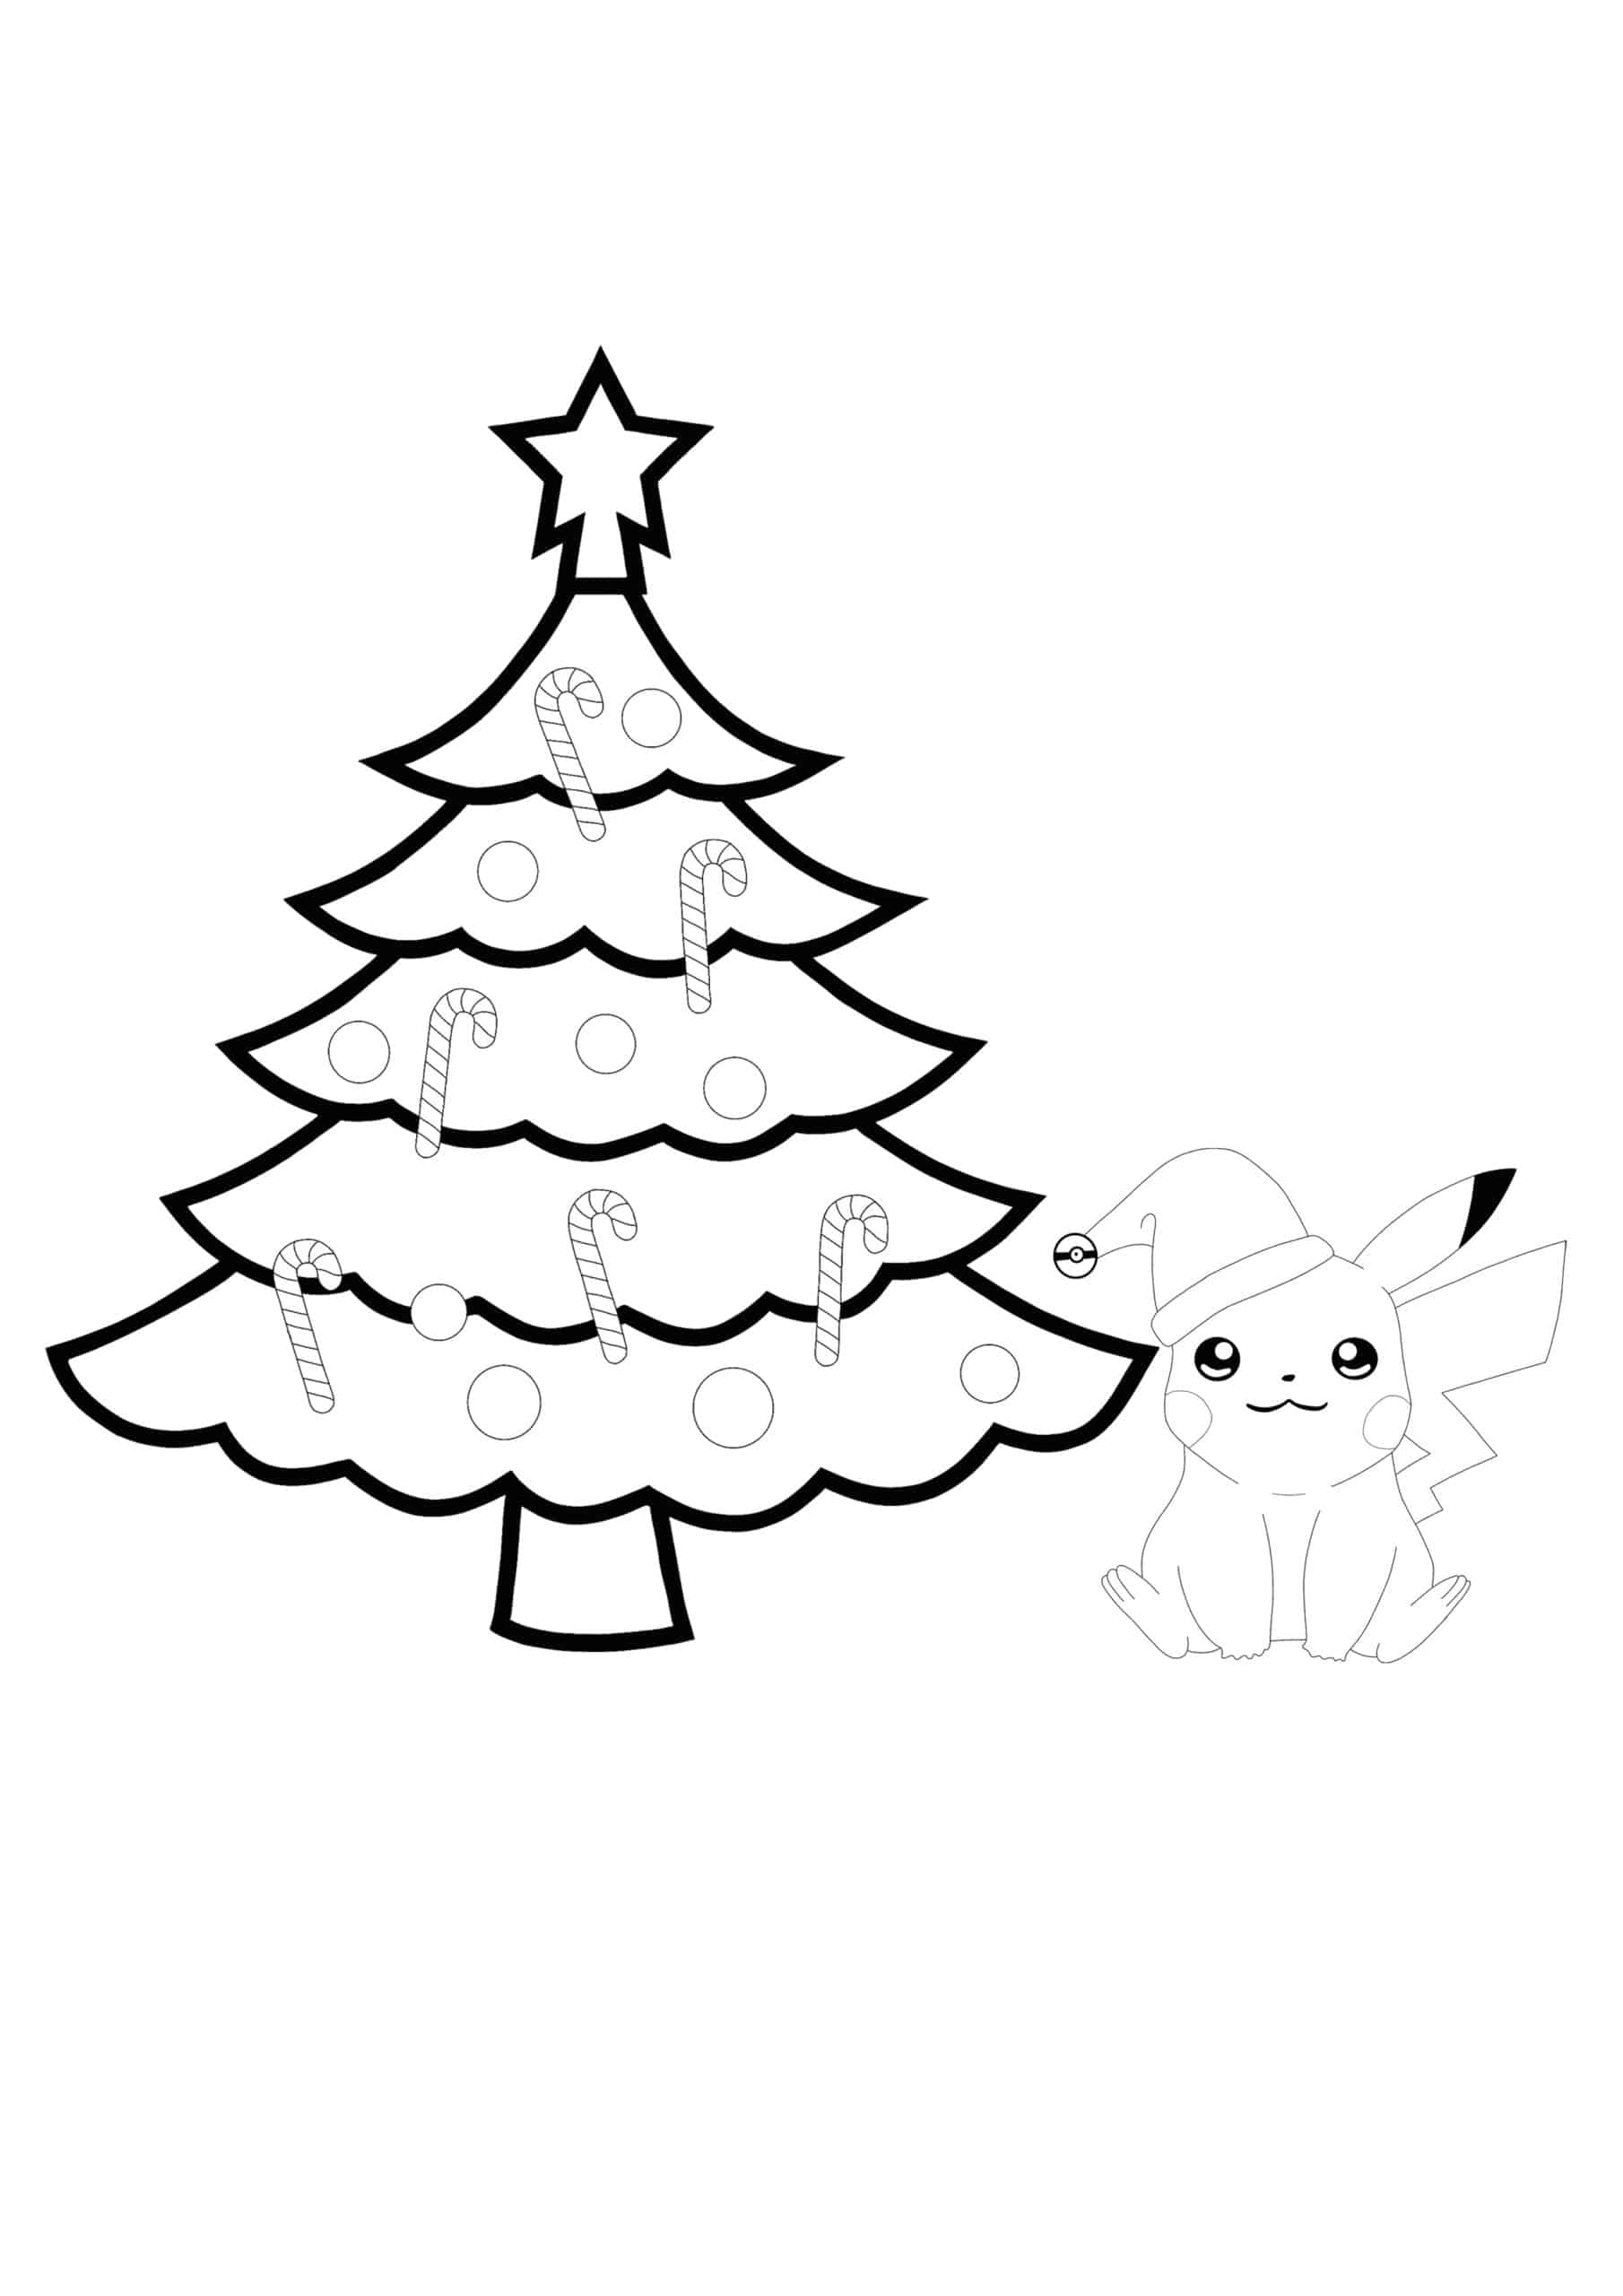 Pikachu and Christmas Tree coloring page